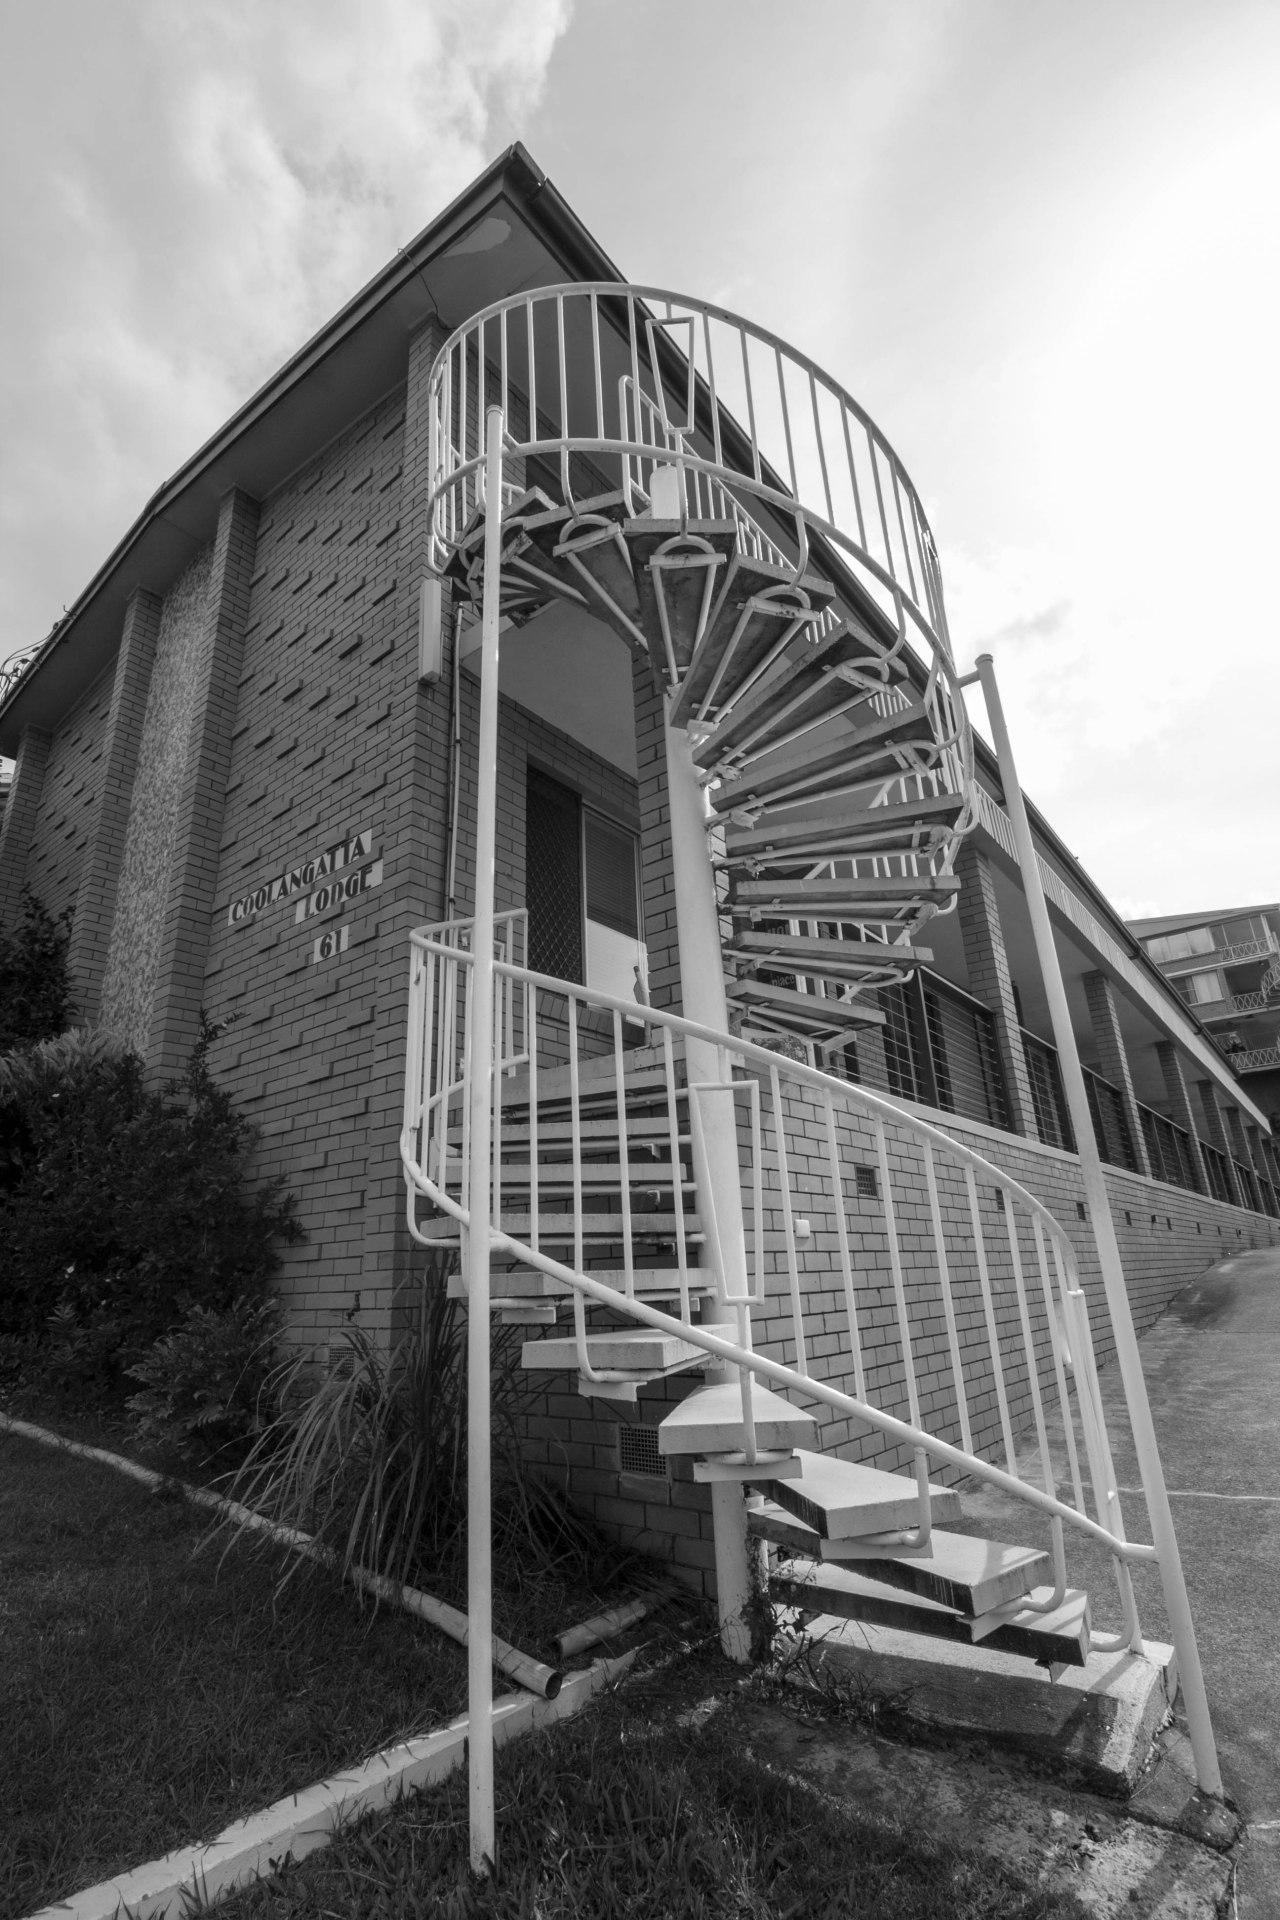 Bleach Festival Gold Coast – fibro housestour